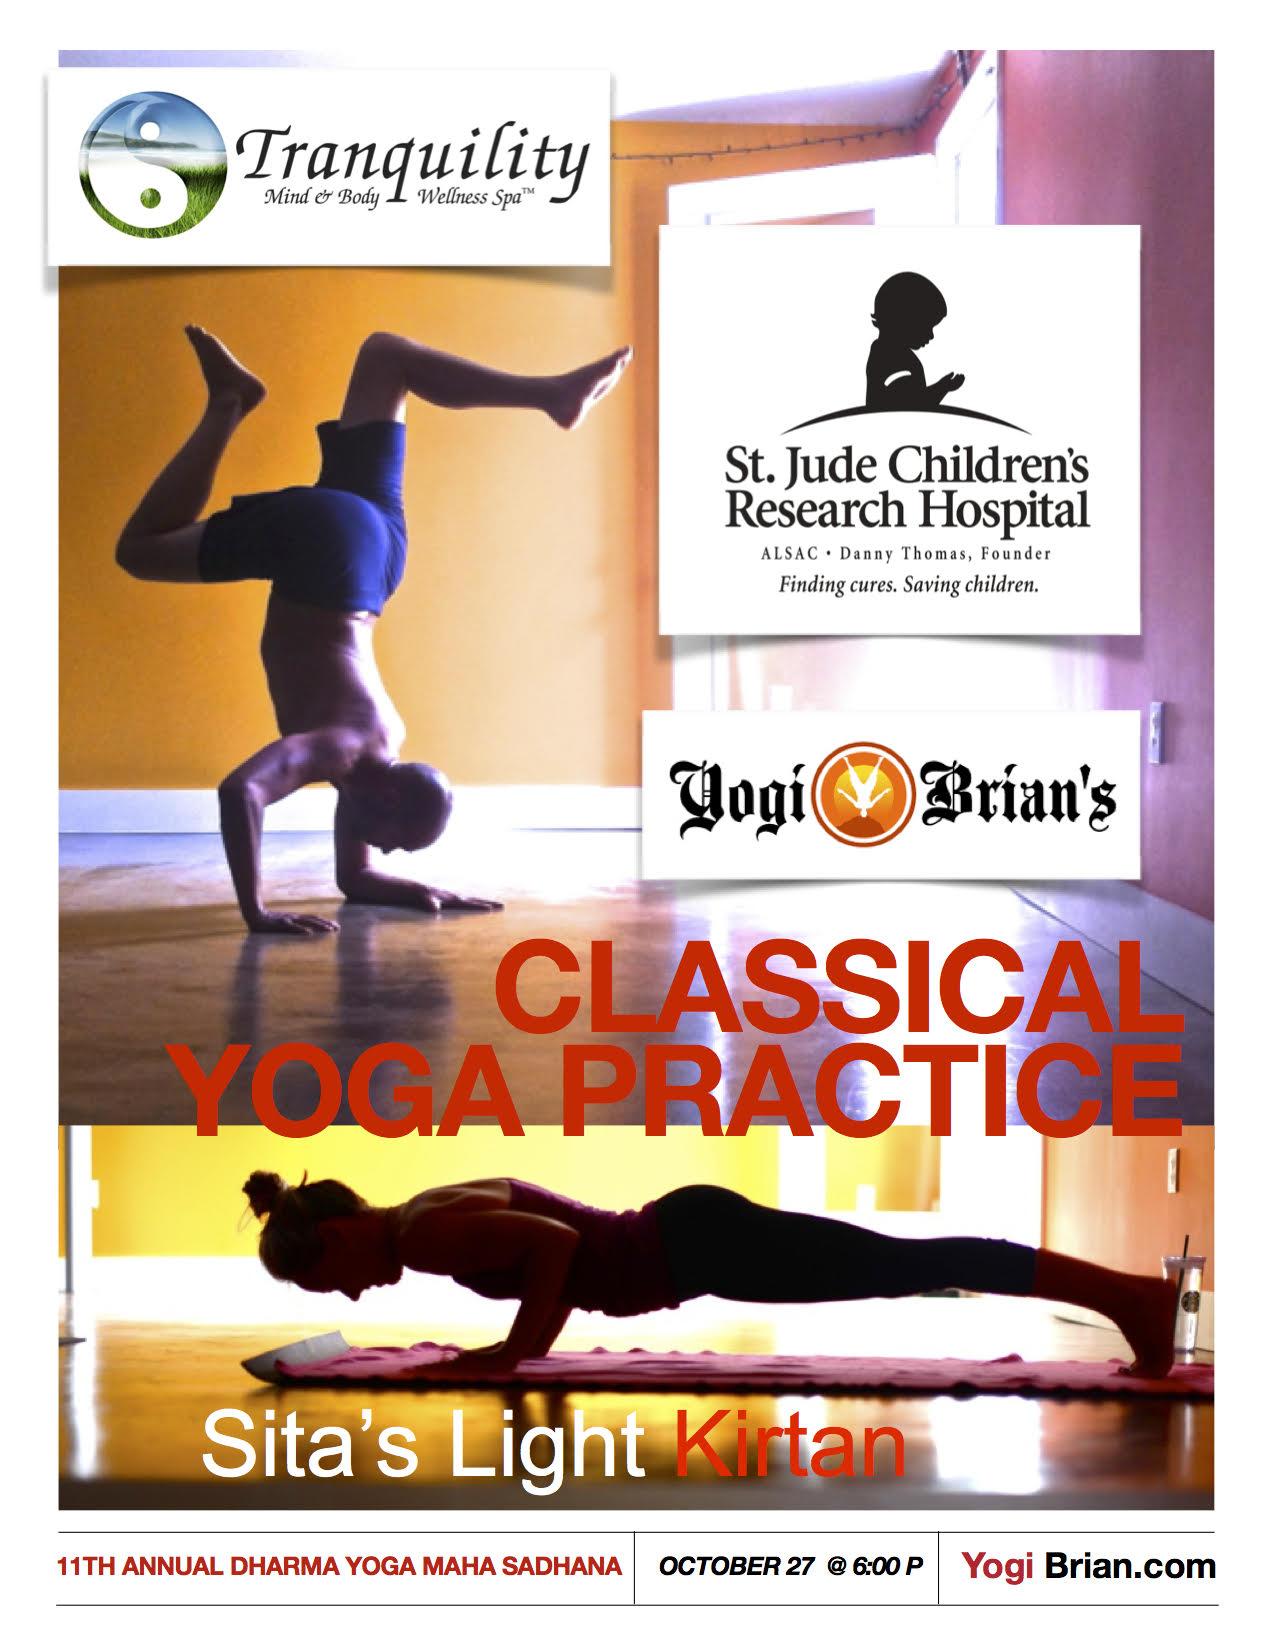 yoga_brian_2018_tranquility_spa_milford.jpg